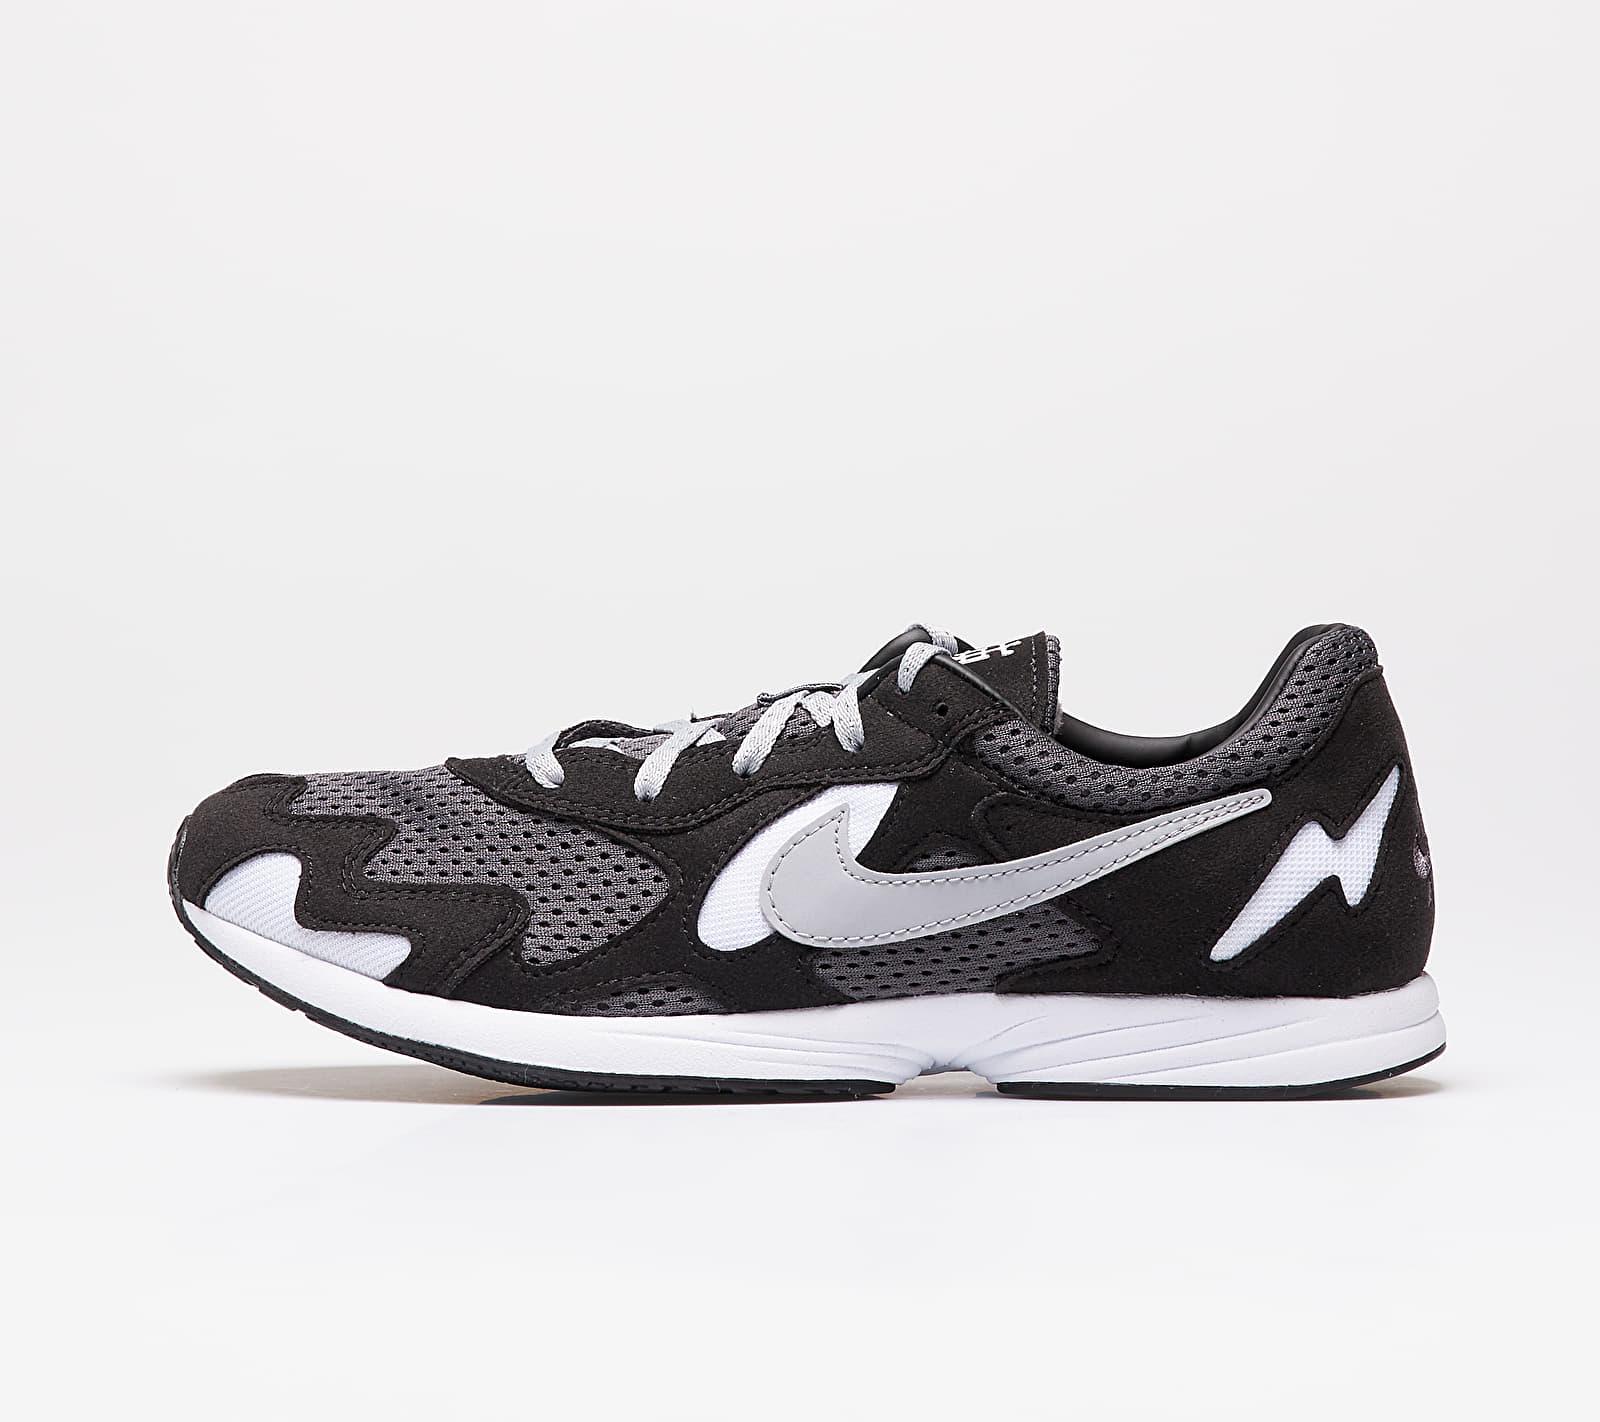 Nike Air Streak Lite Black/ Wolf Grey-Dark Grey-White CD4387-001